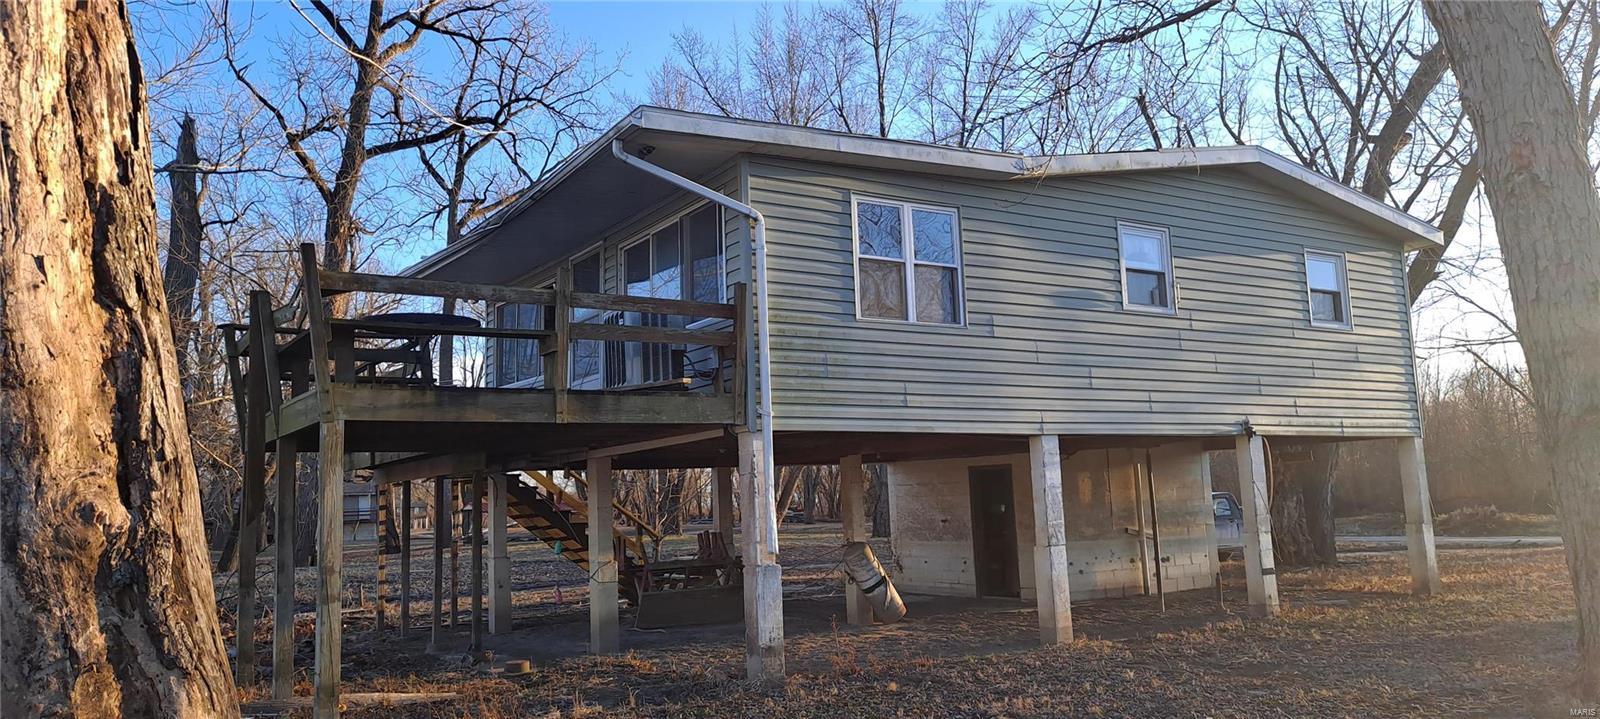 38682 Pike 9203 Property Photo - Annada, MO real estate listing